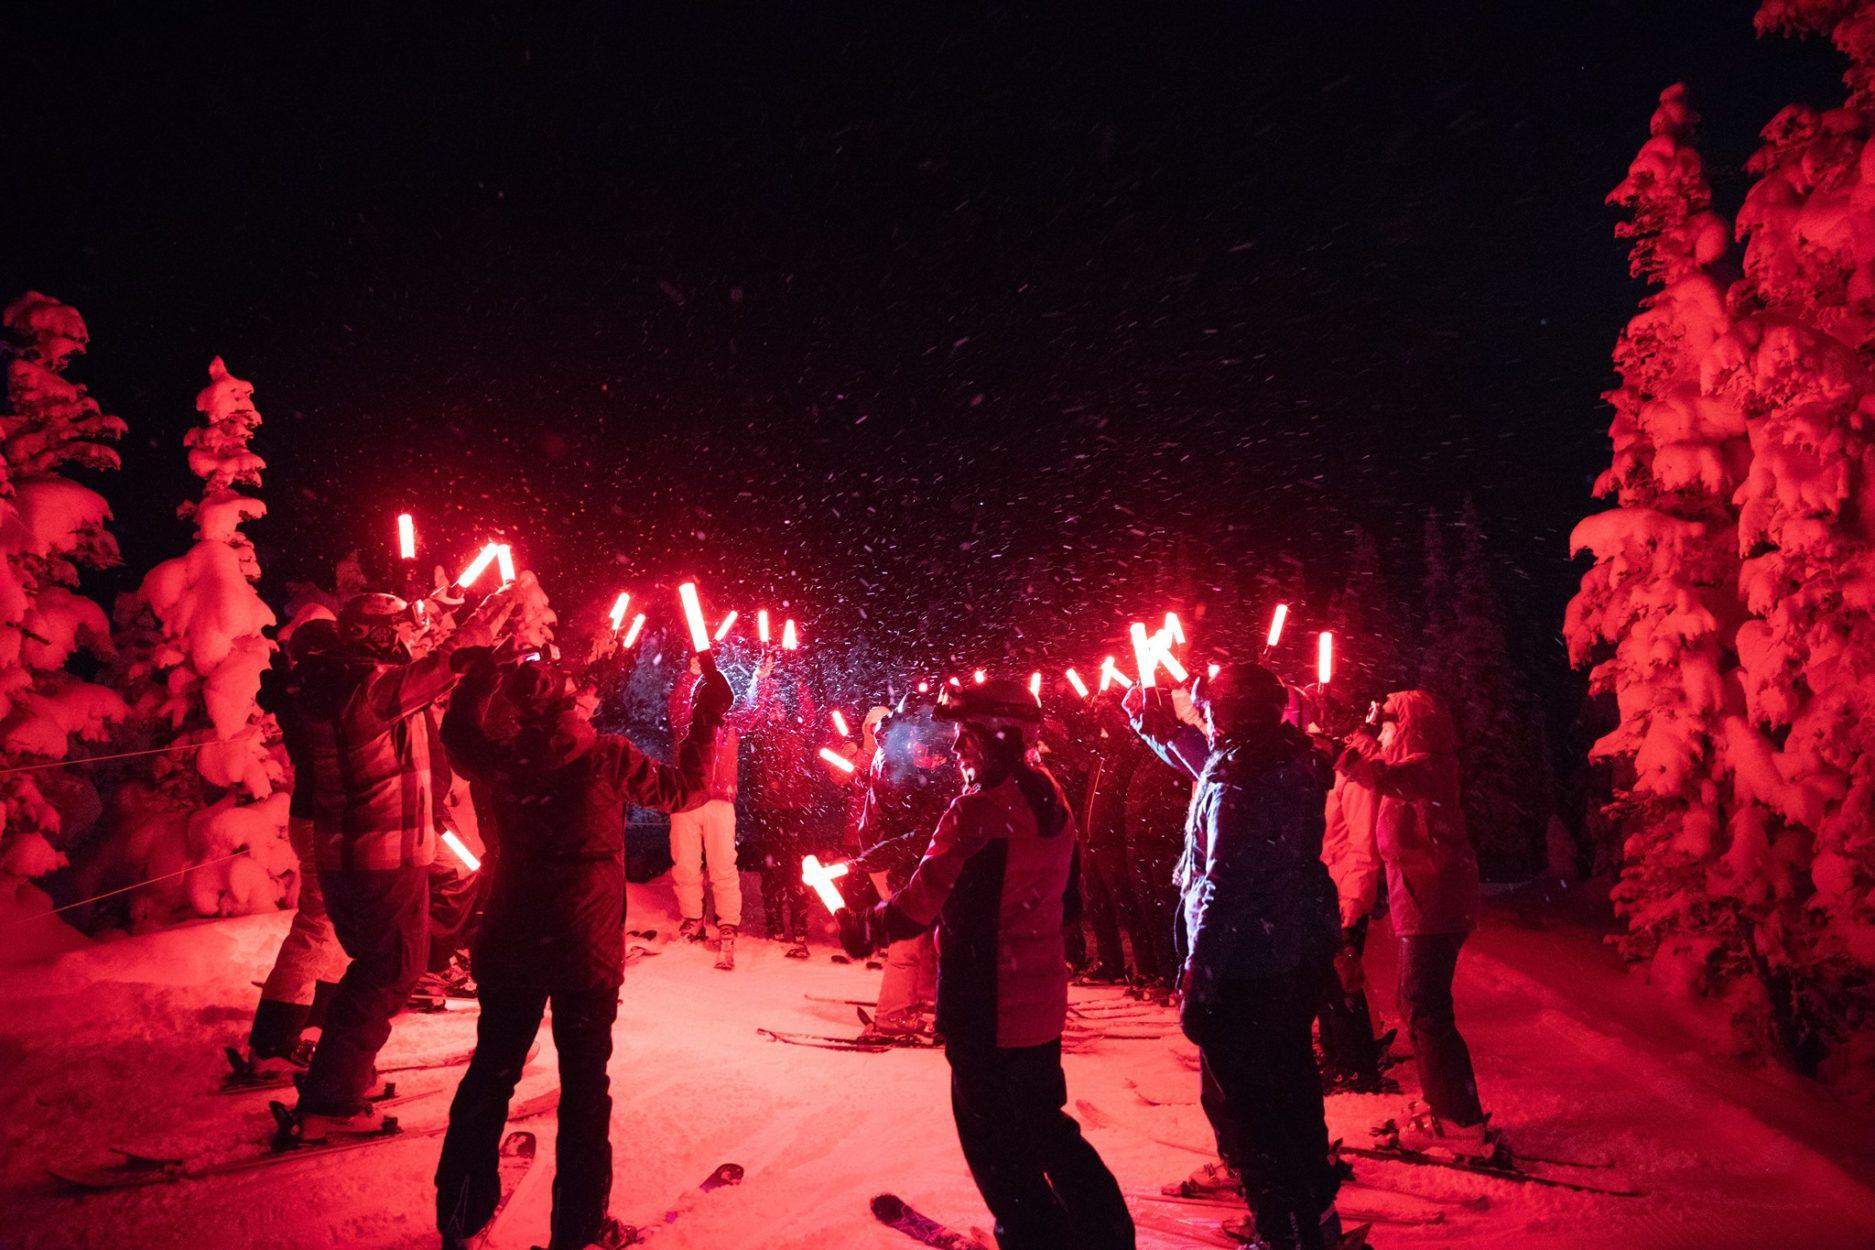 Torchlight Parade at Sunshine Mountain Lodge on Where Rockies